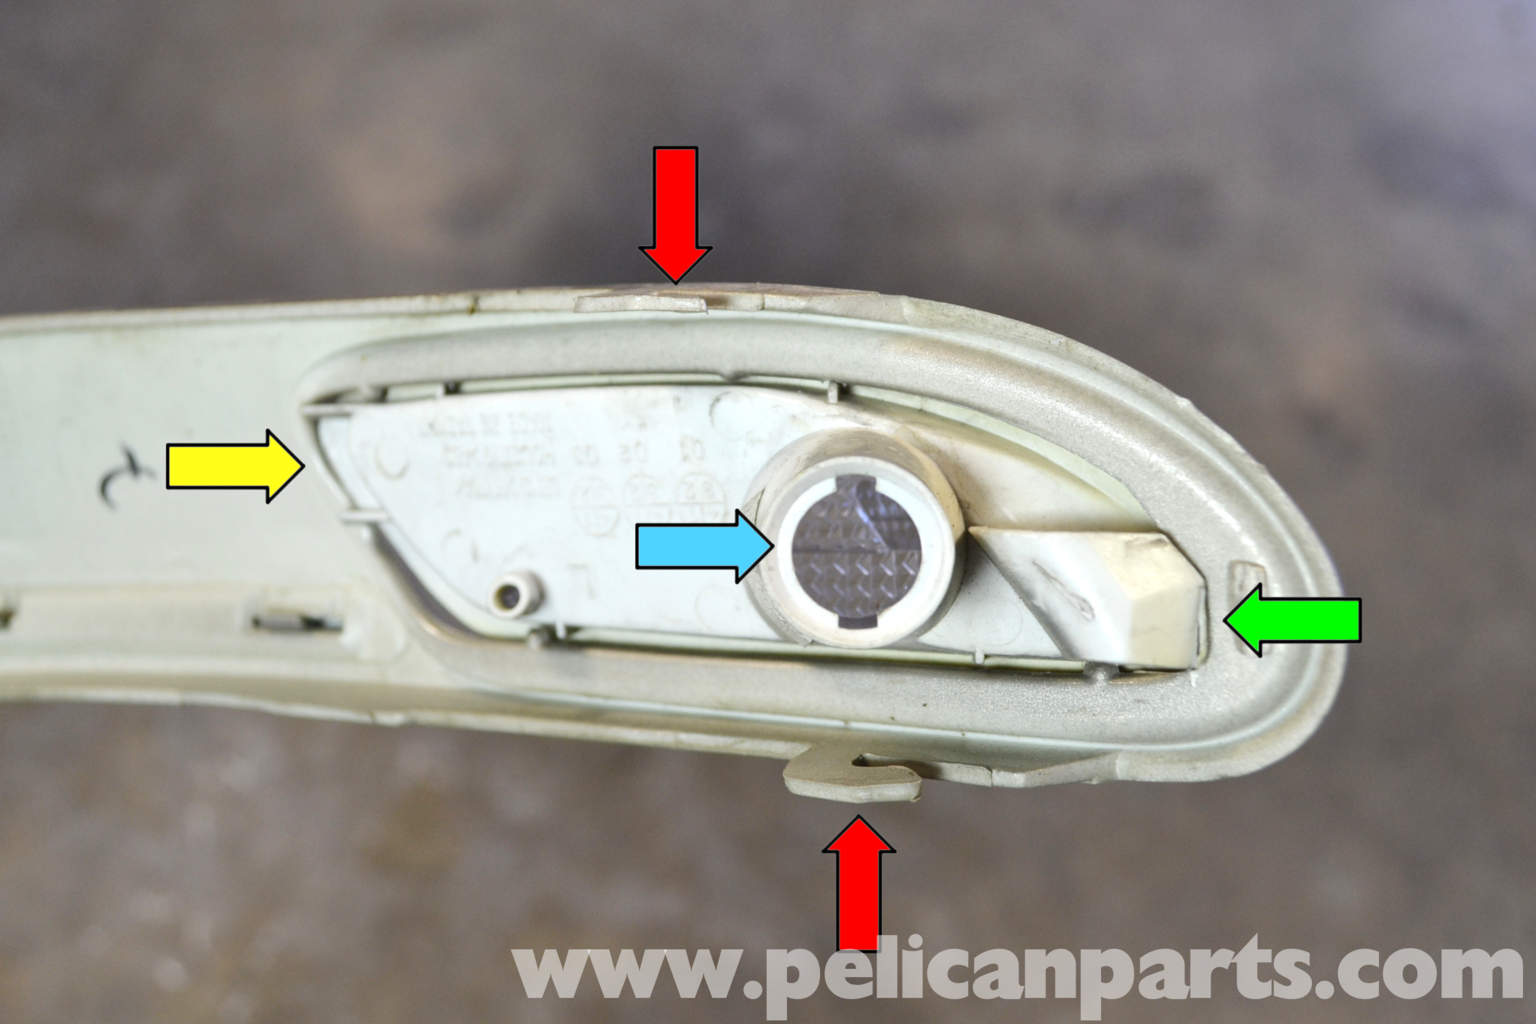 Mercedes benz w203 exterior molding replacement 2001 for Mercedes benz exterior parts